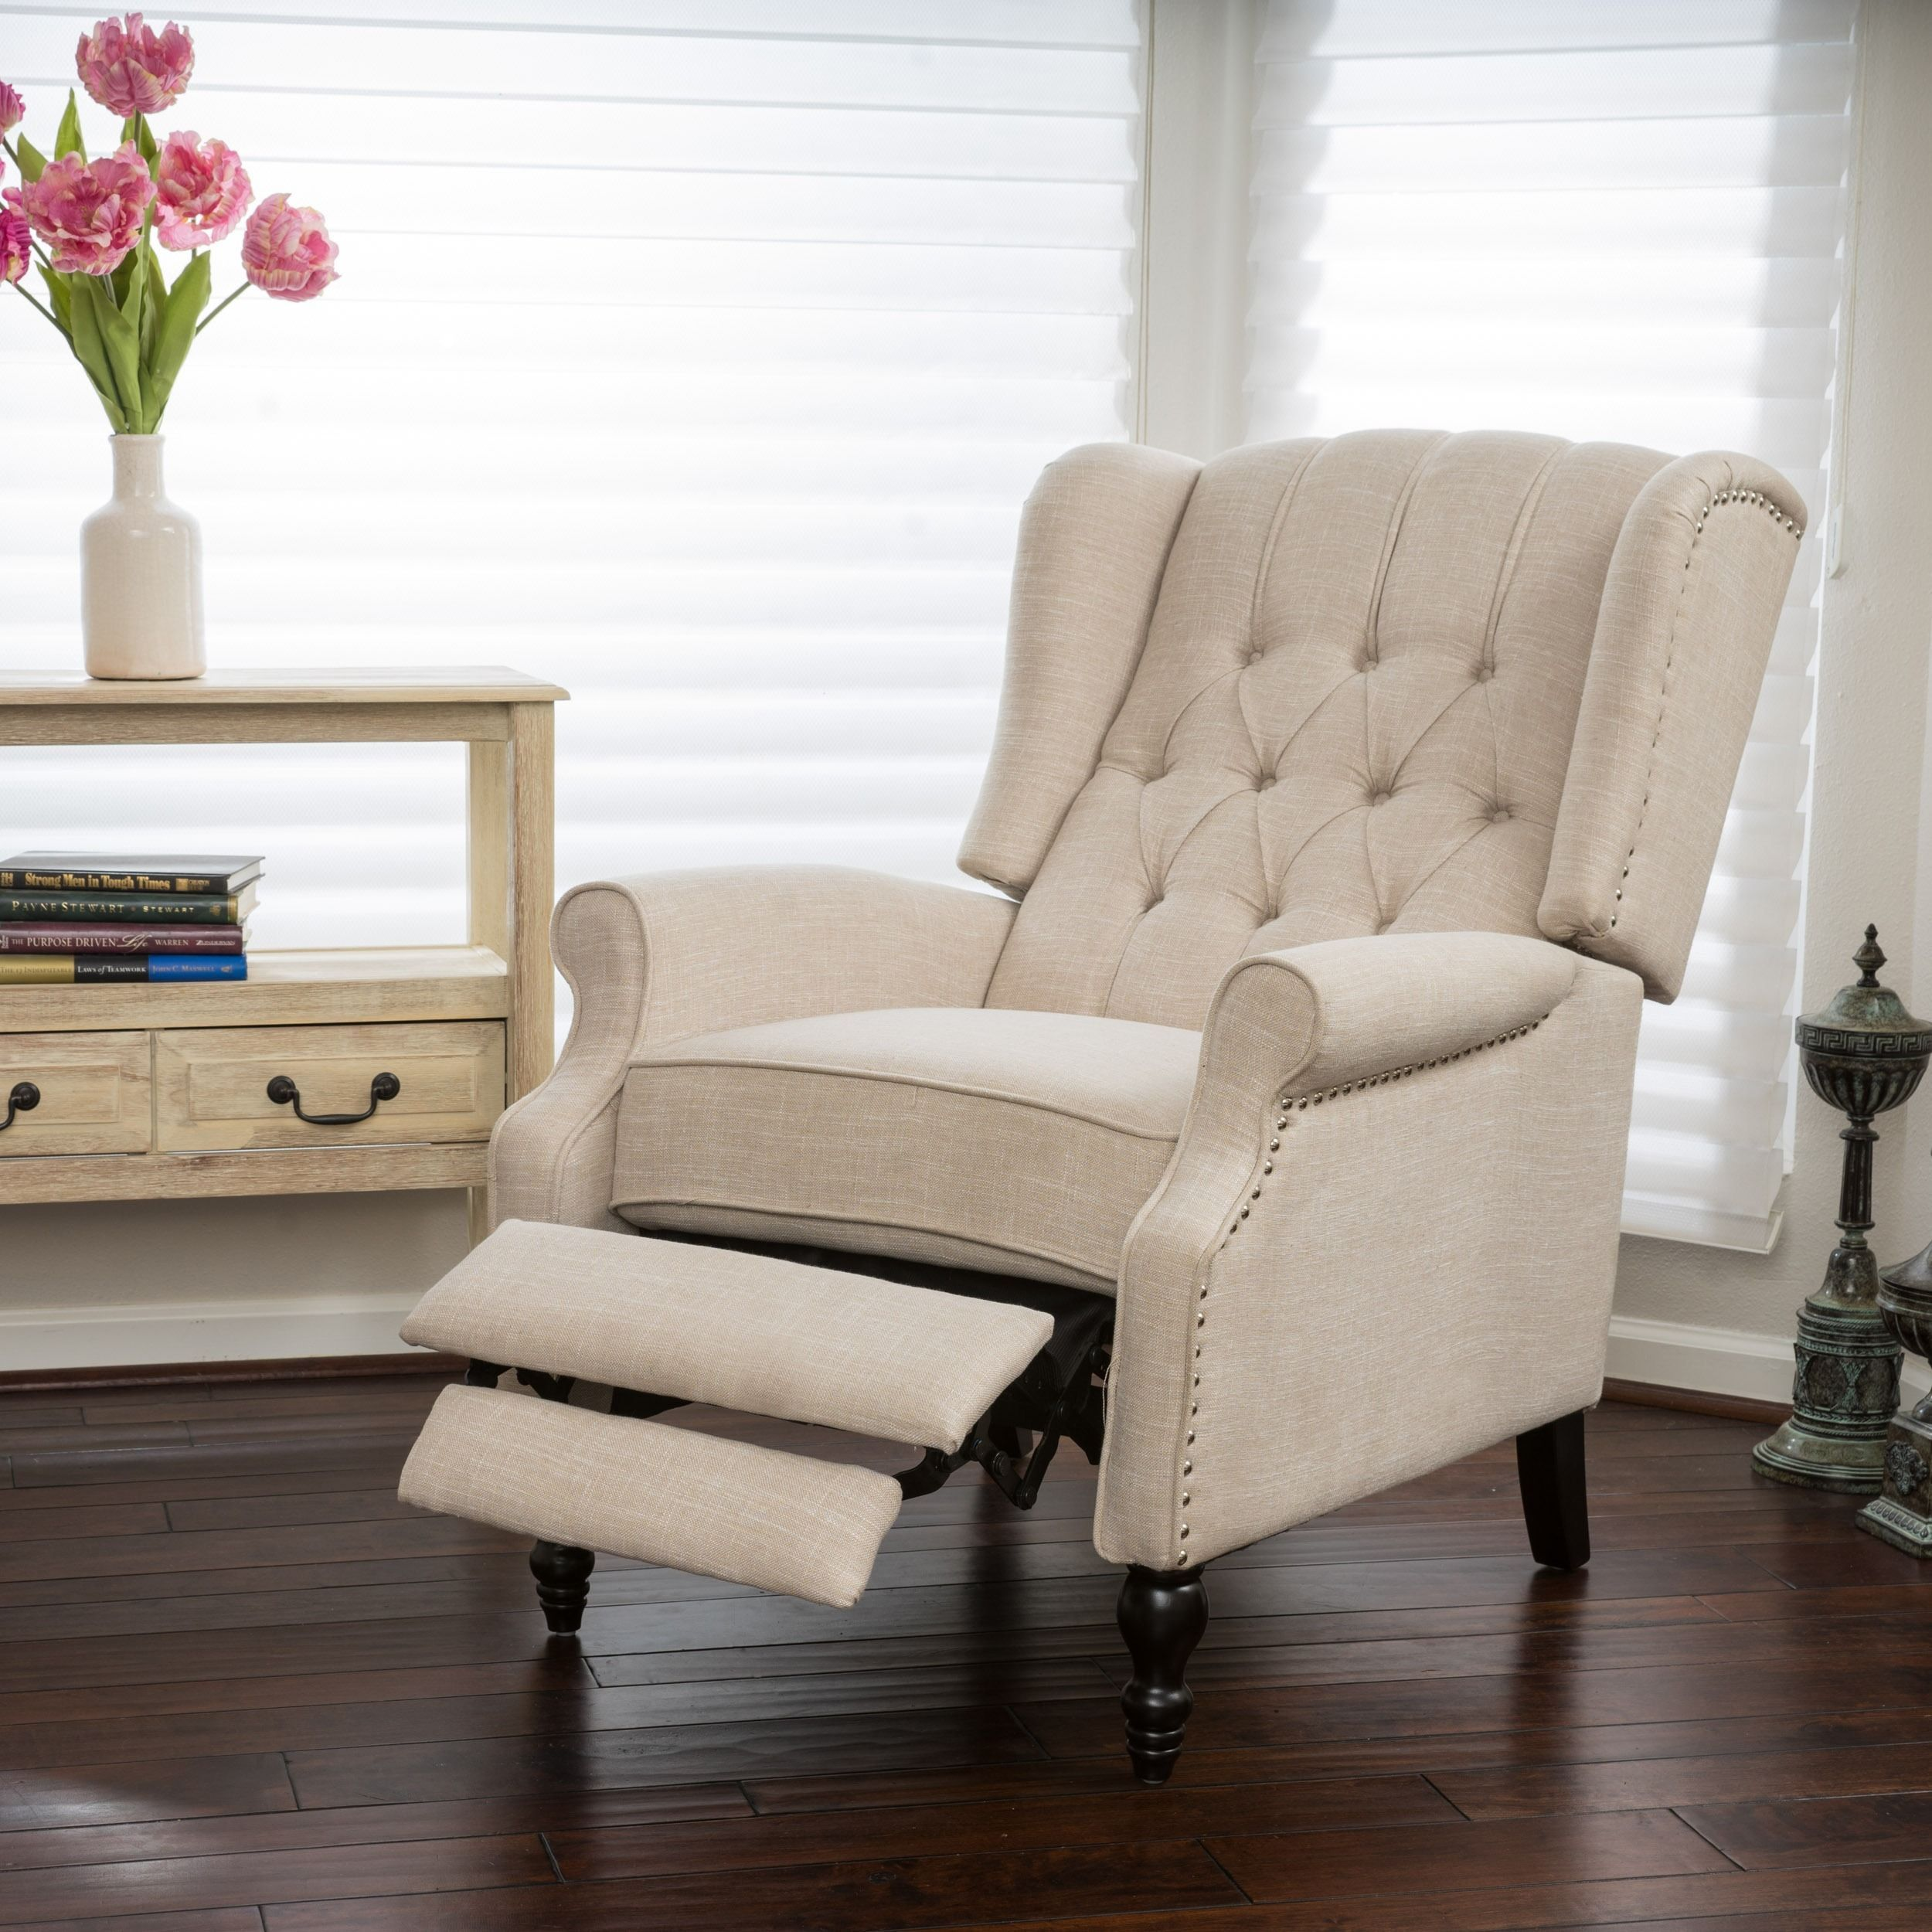 Local made sofa set tissus finish relaxon group - Sofa Condo Inclinable Lectrique En Cuir De Style Contemporain Choix De Cuirs Mobilier De Salon Pinterest Style Condos And Sofas